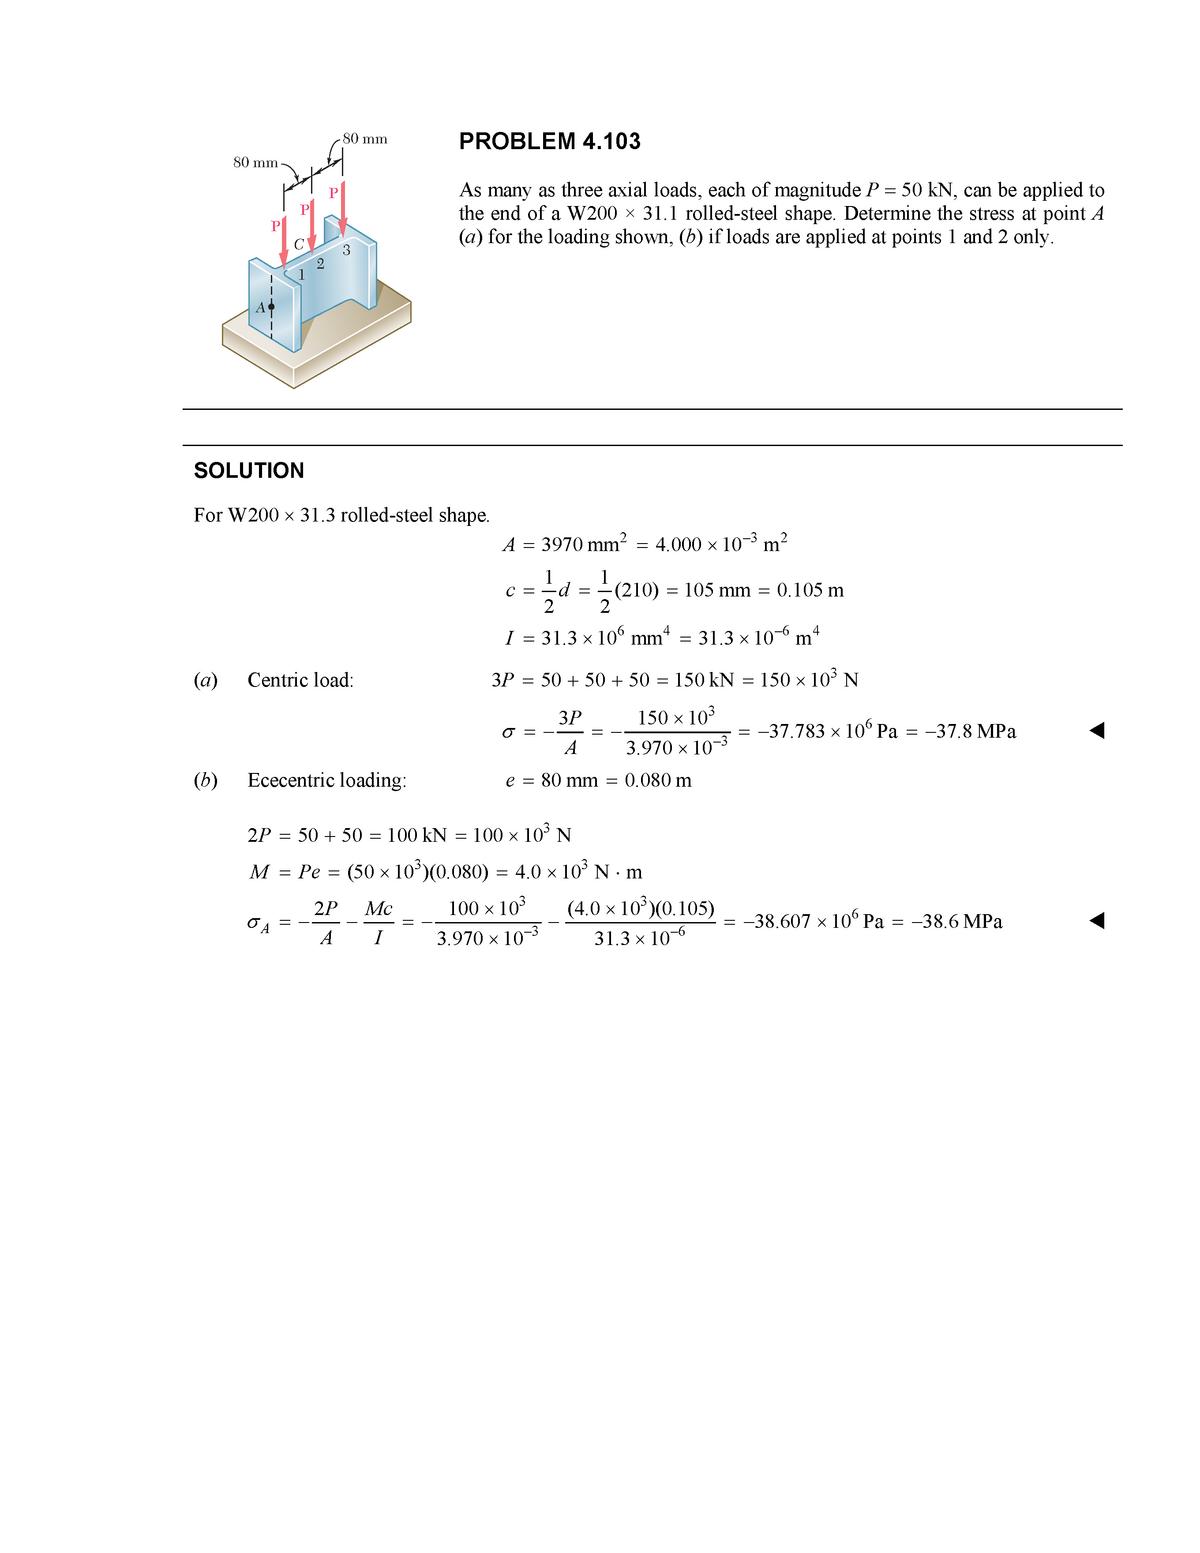 HW 11 - Homework set 11 Solutions - CE 3110: Mechanics Of Materials